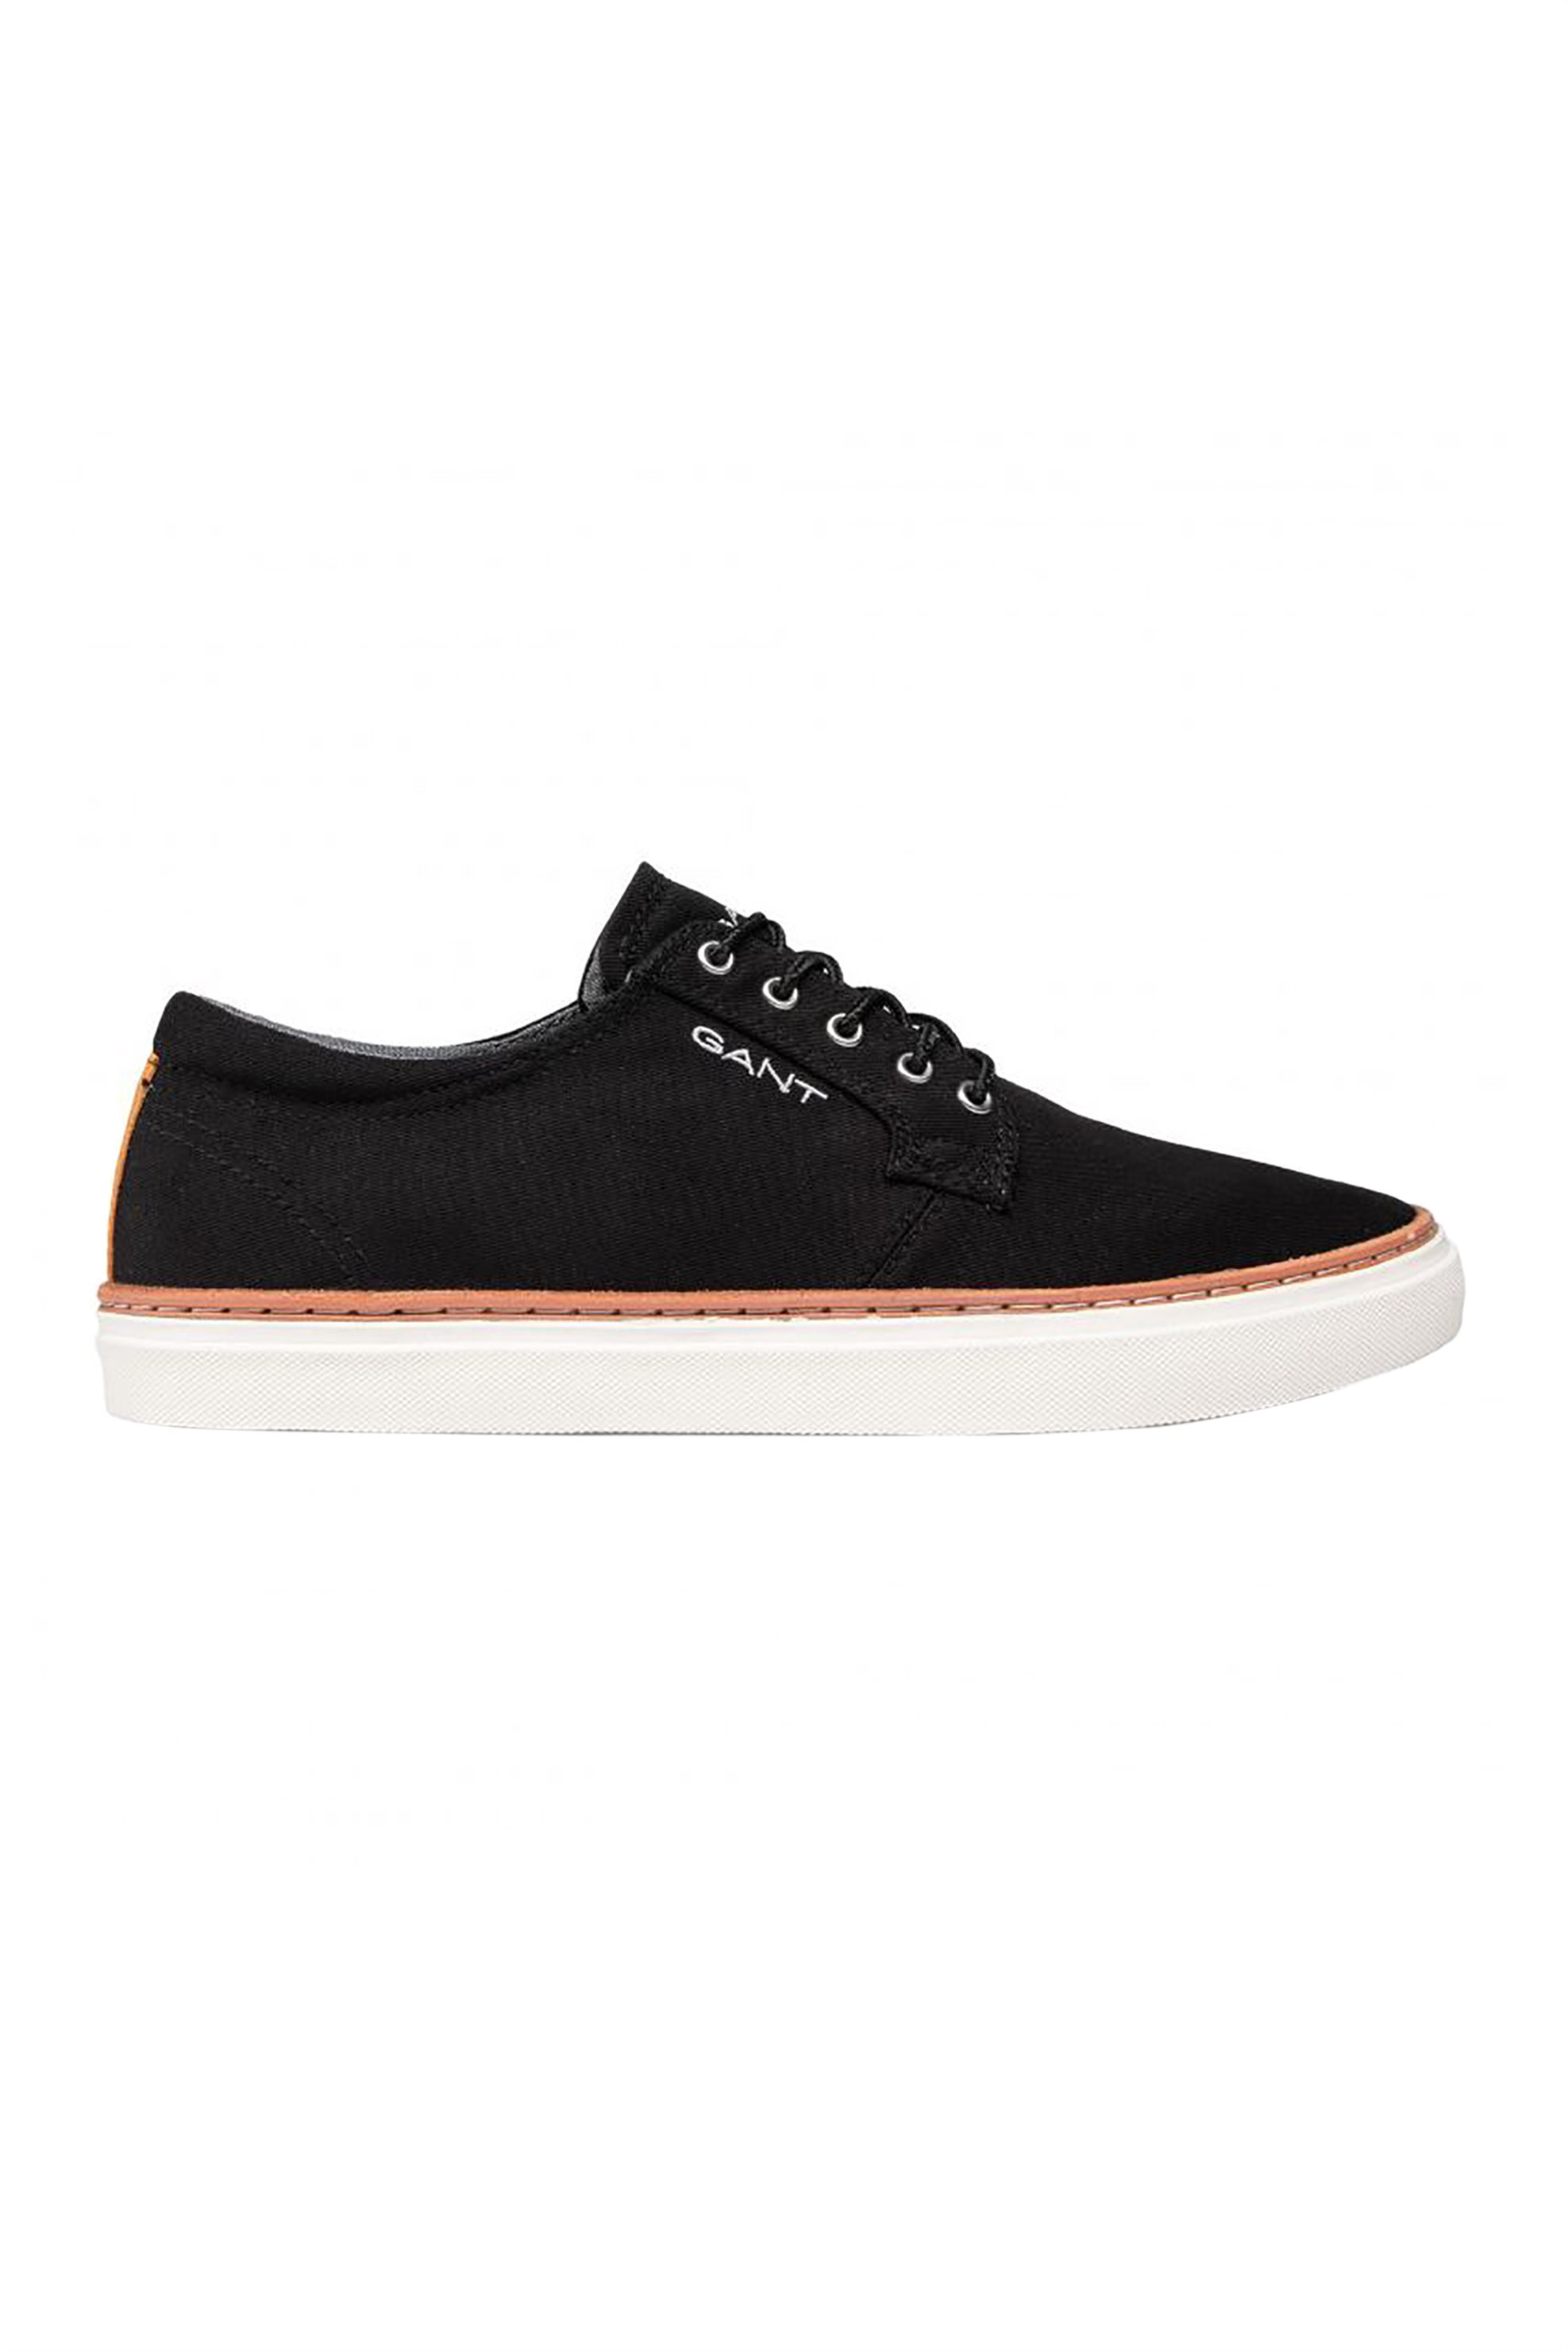 "Gant ανδρικά sneakers με logo print στο πλάι και δερμάτινες λεπτομέρειες ""Prepville"" – 22638666 – Μαύρο"